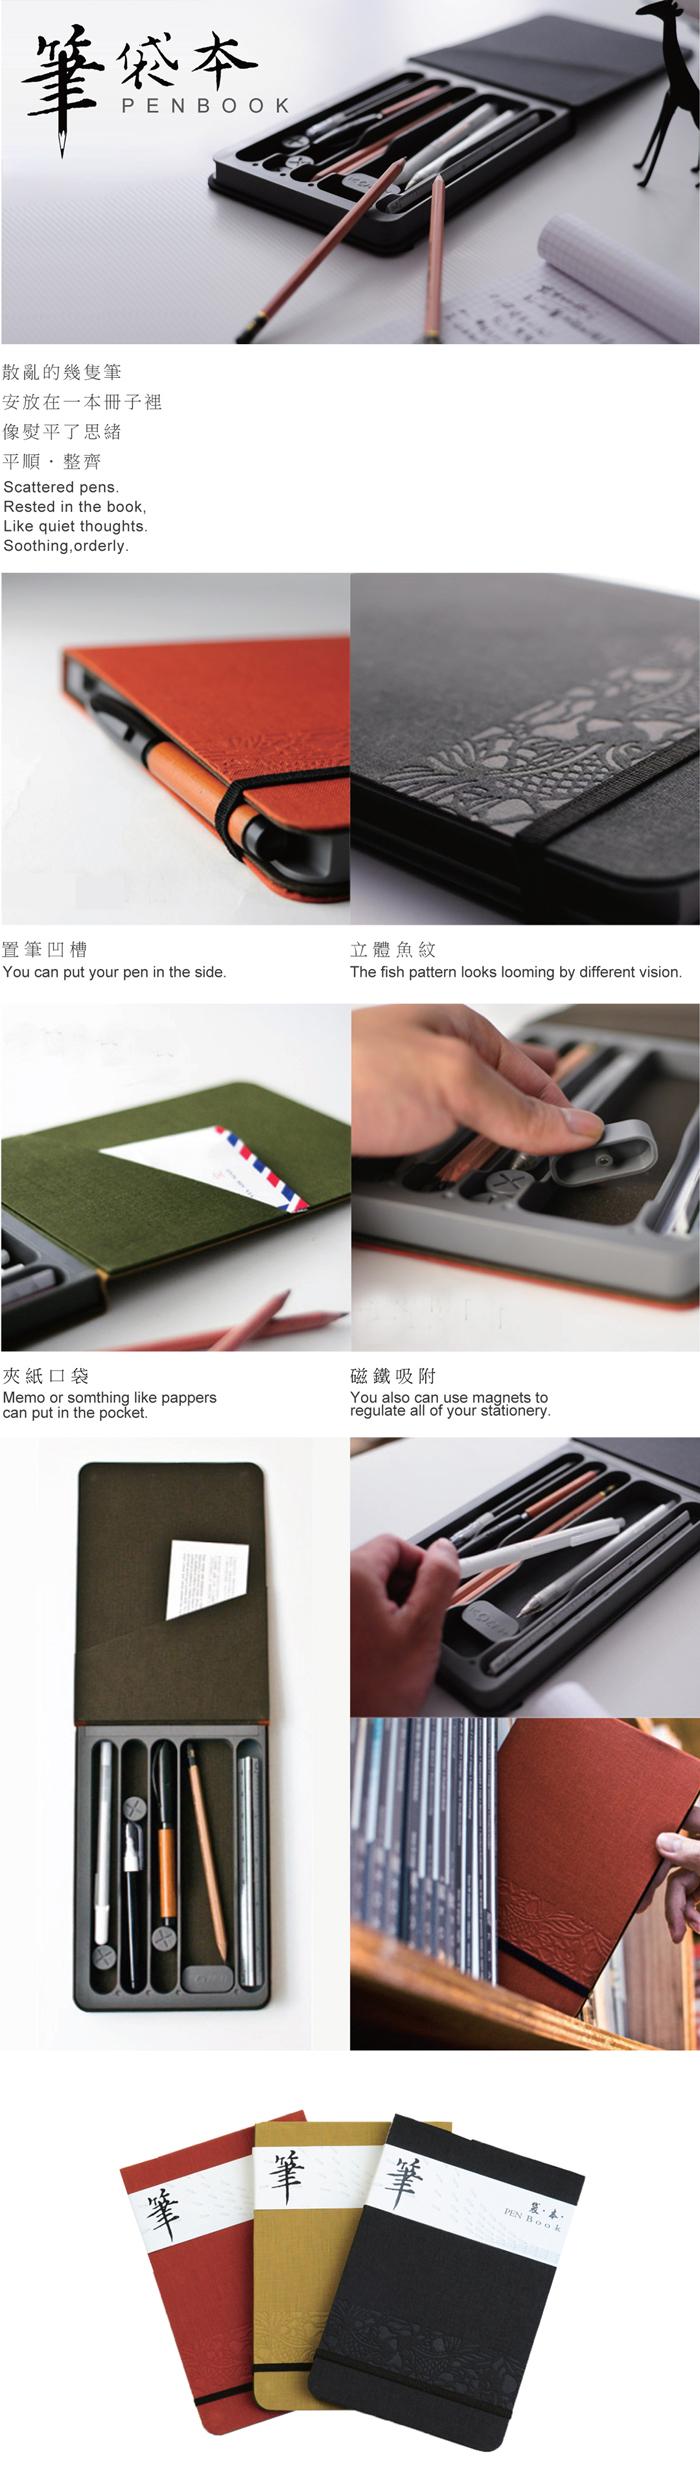 KOAN+ 筆袋本 Penbook 芥末綠